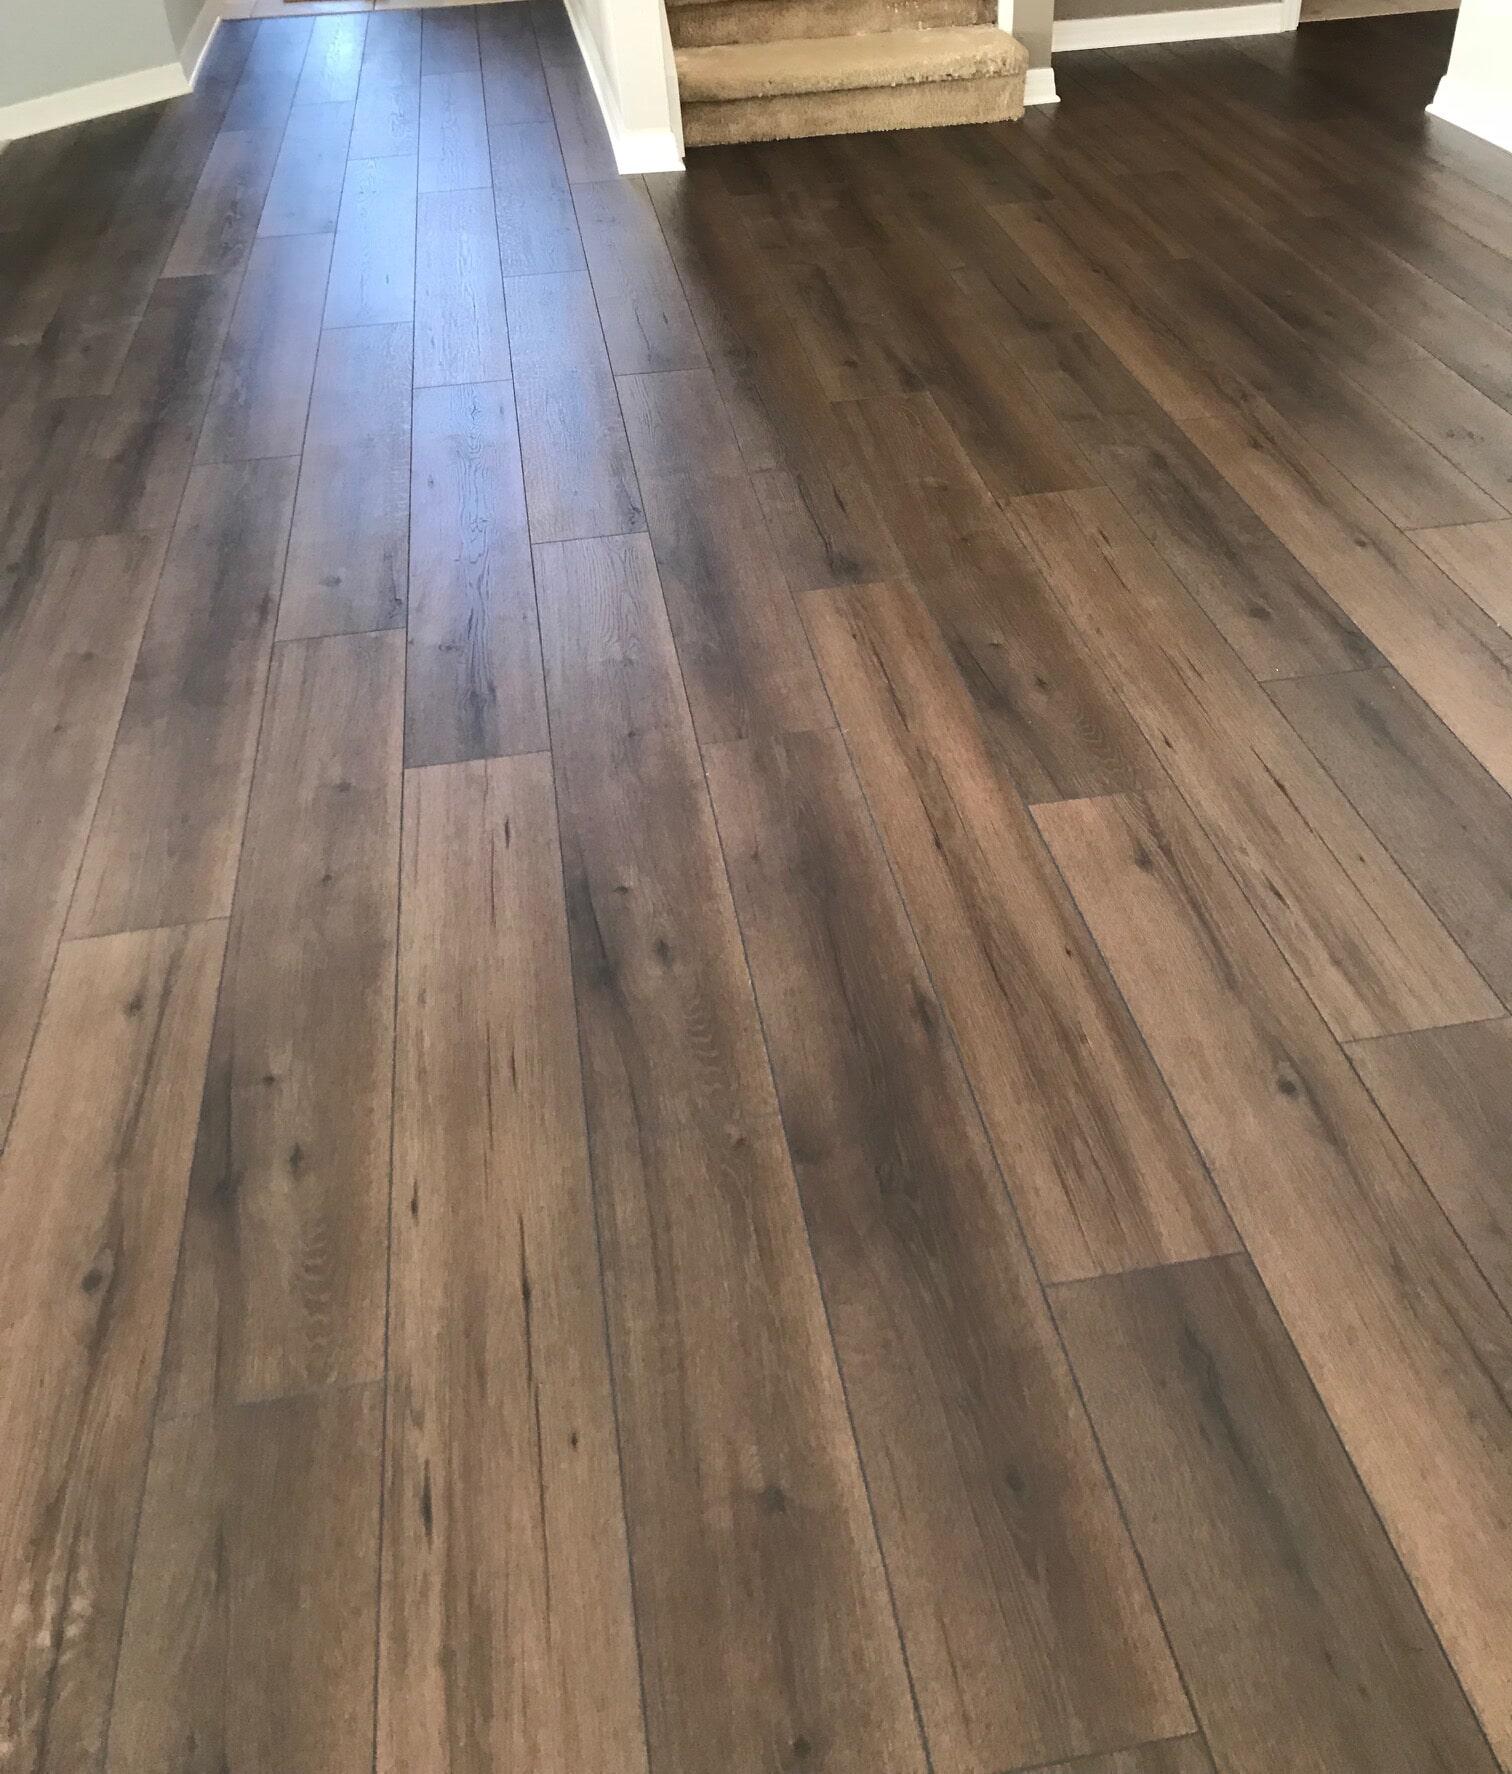 Hardwood flooring from The Flooring Center in Lake Mary, FL